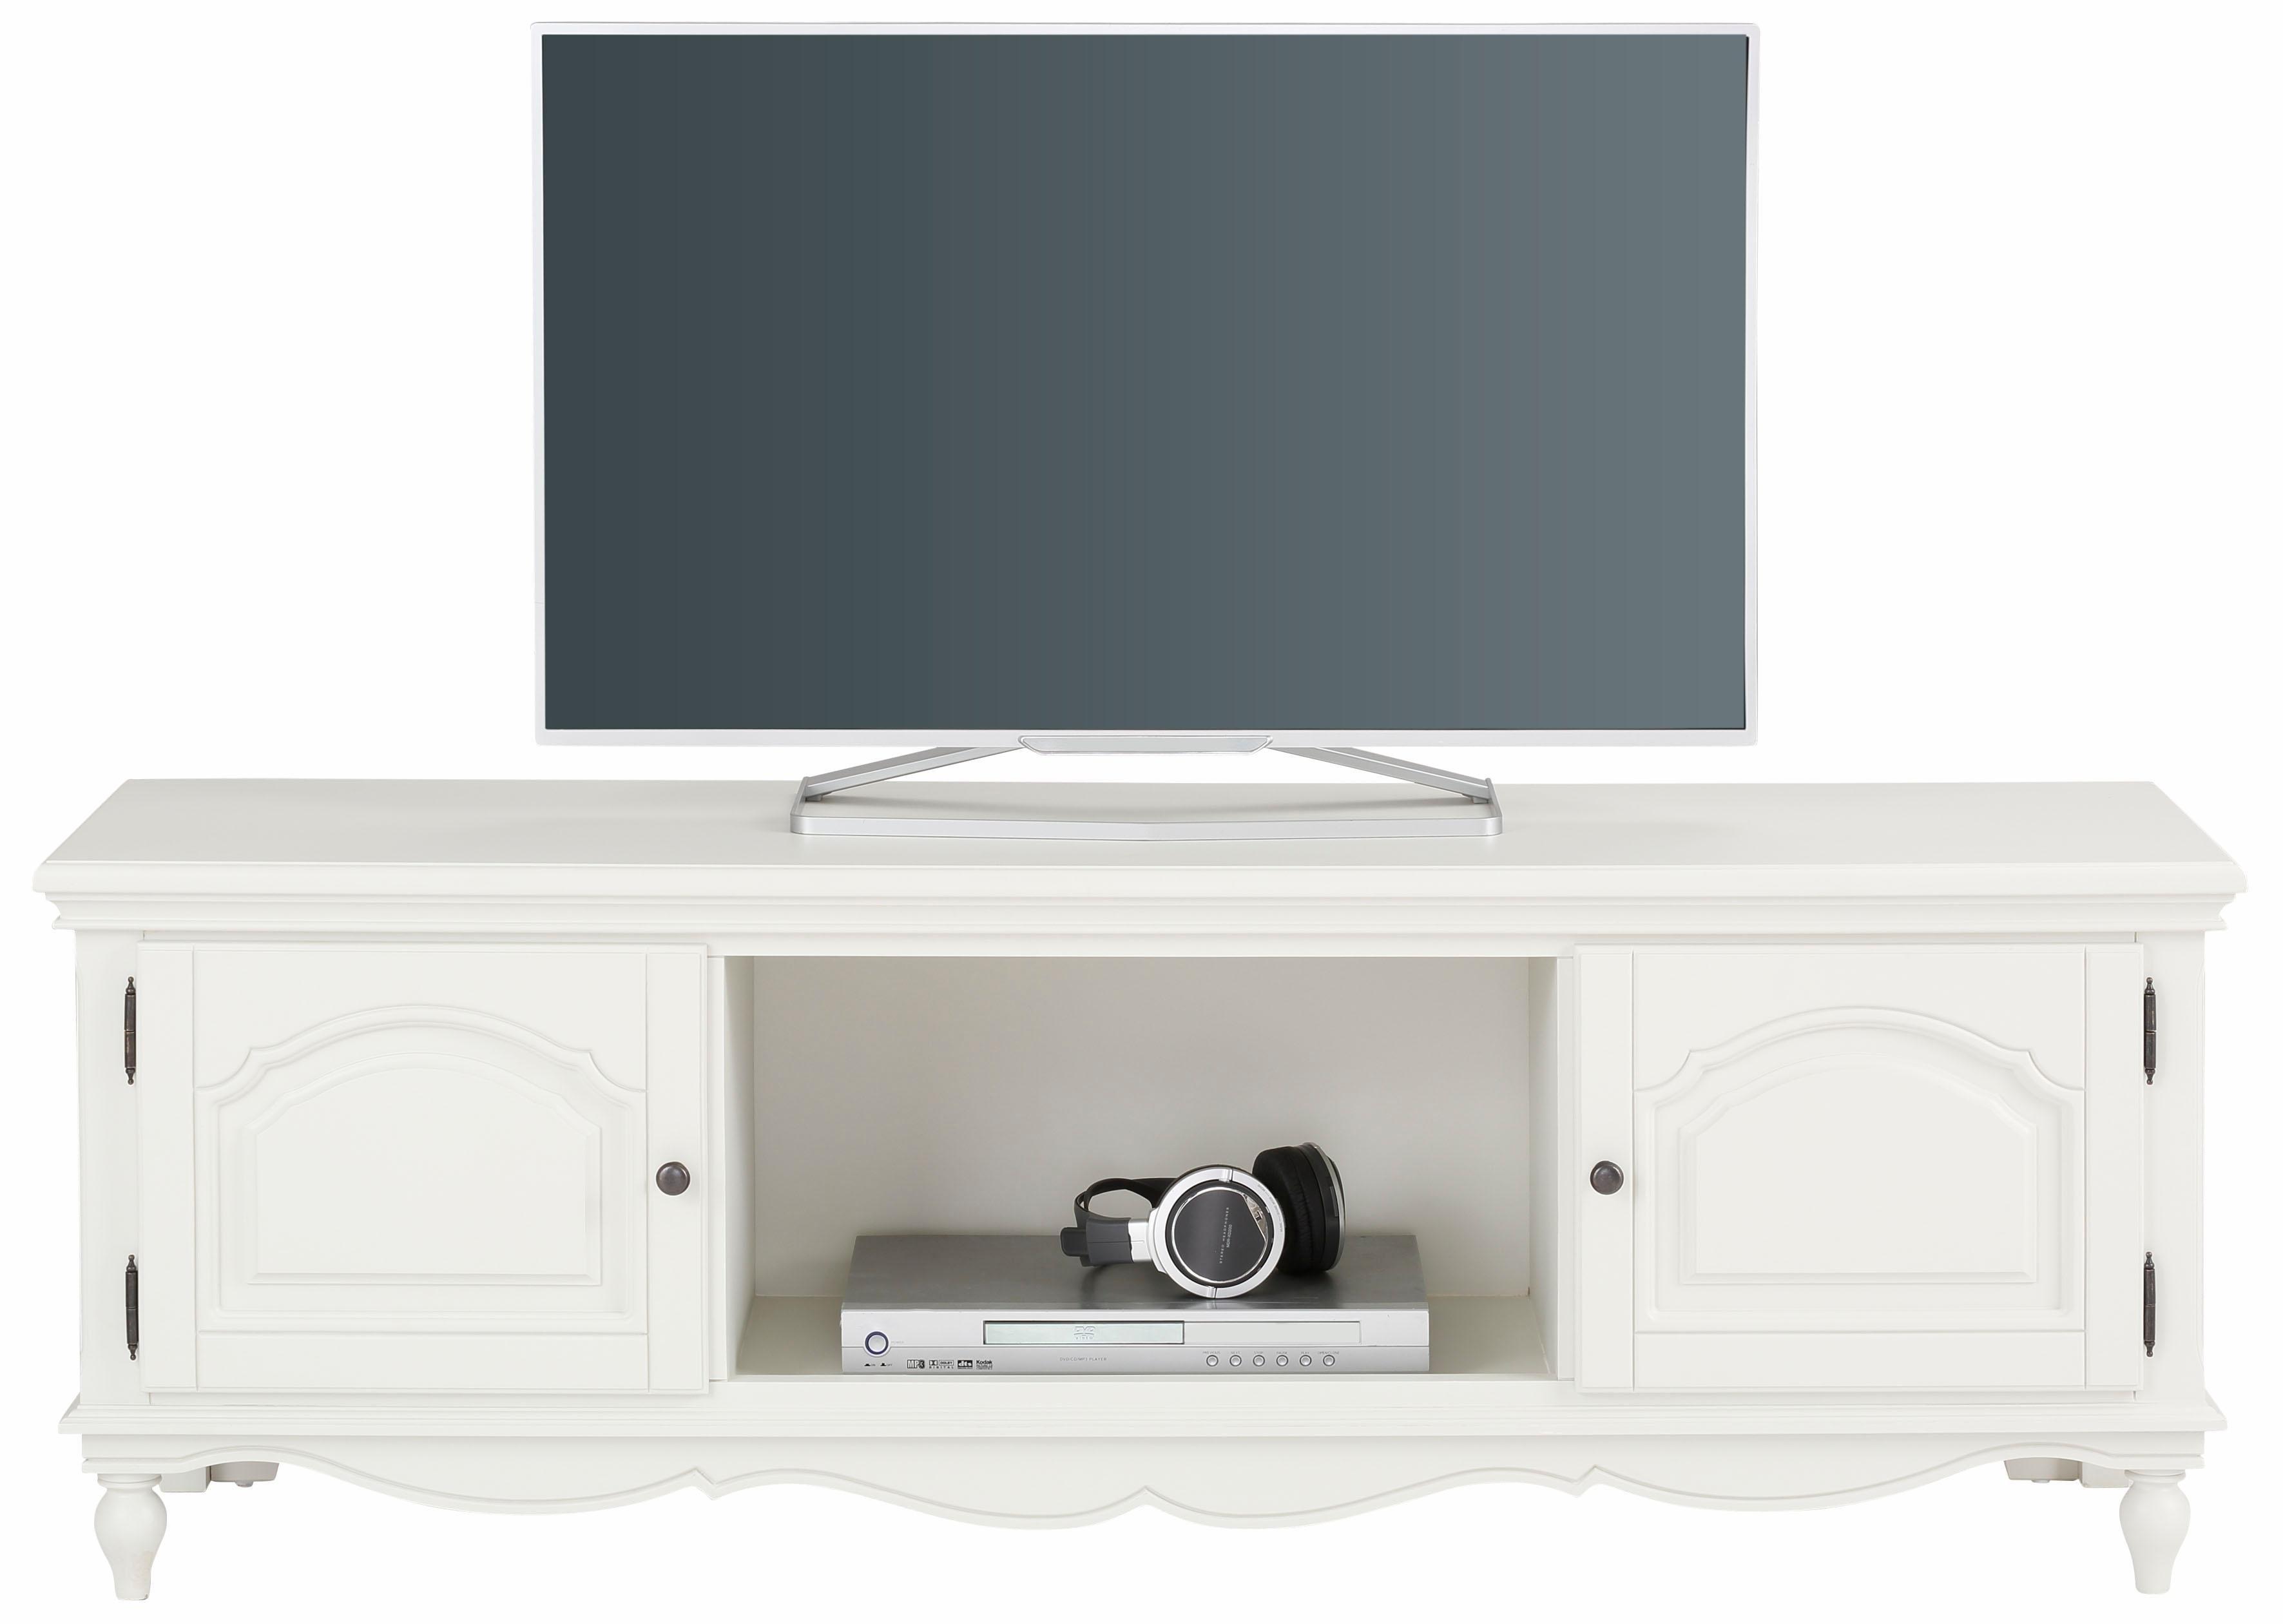 Premium Collection By Home Affaire Home affaire tv-meubel »Katarina«, met gebogen plint, breedte 159 cm nu online bestellen